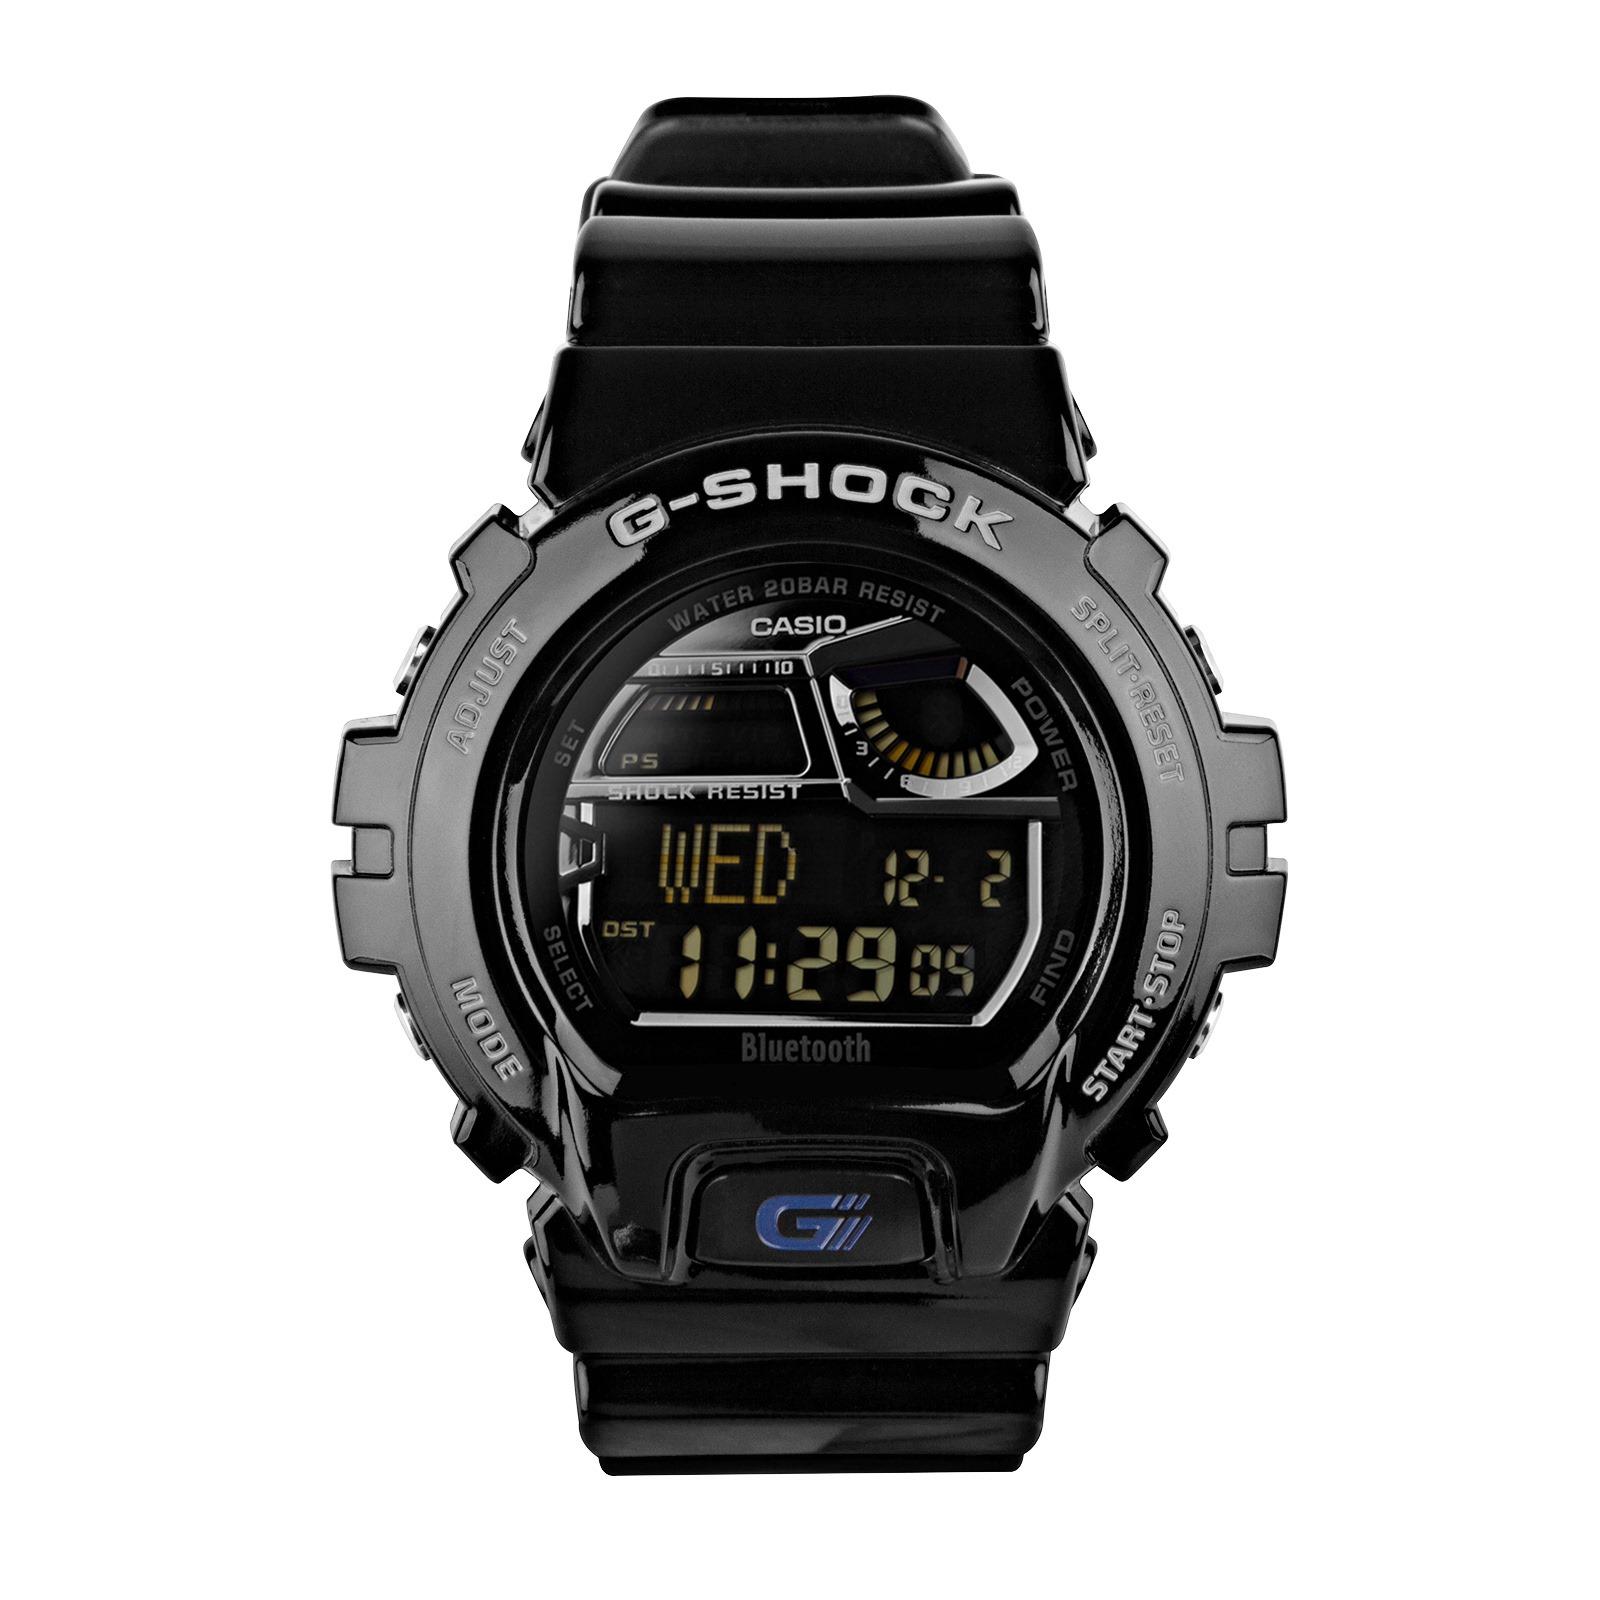 Casio G-SHOCK GB-6900AA-1 Bluetooth Low Energy Watch